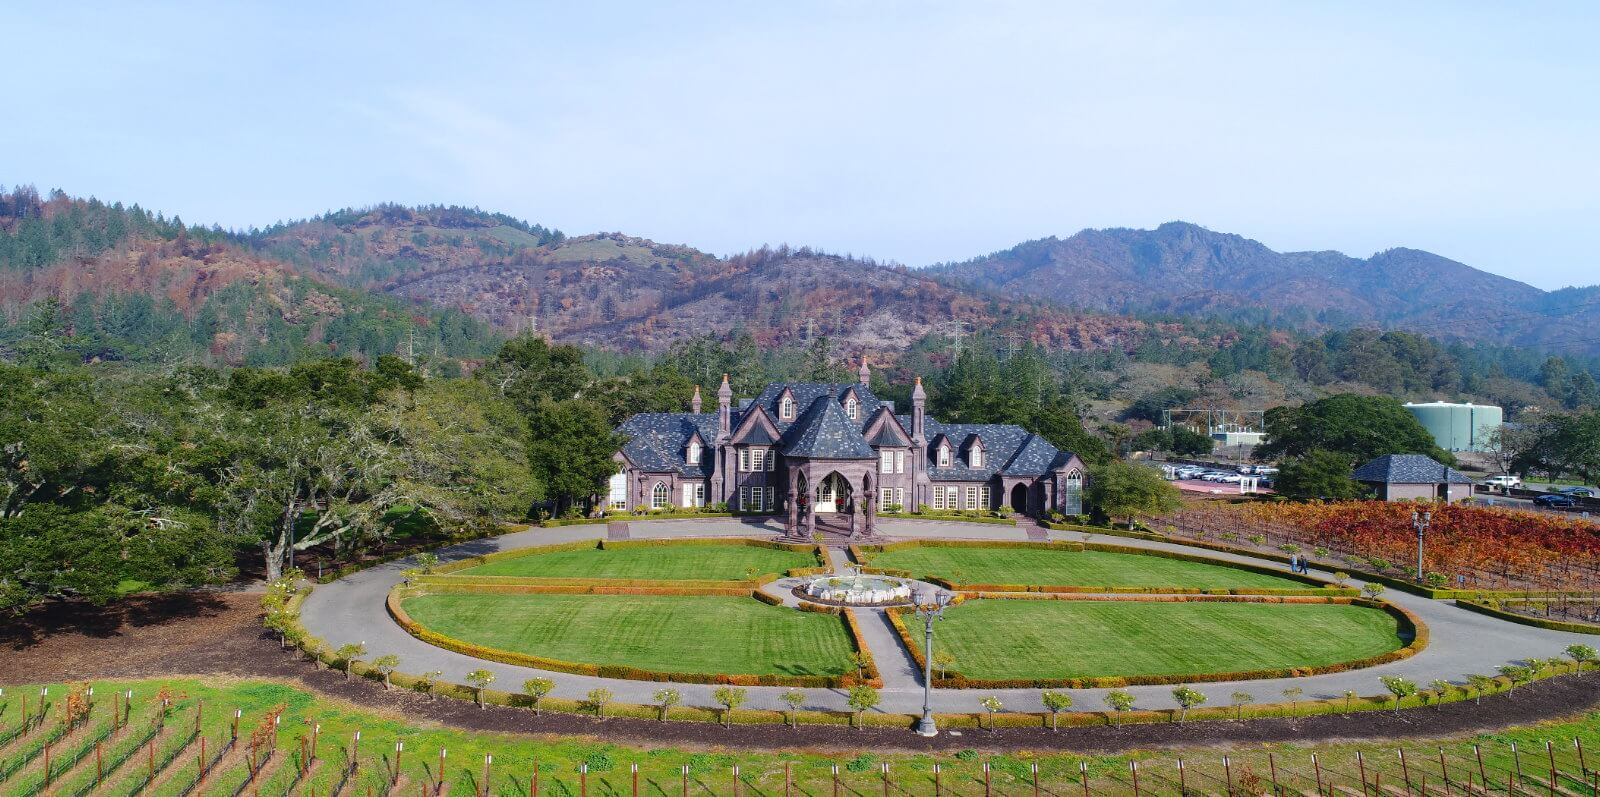 Sonoma-Valley-Wine-Tours-Sonoma-County